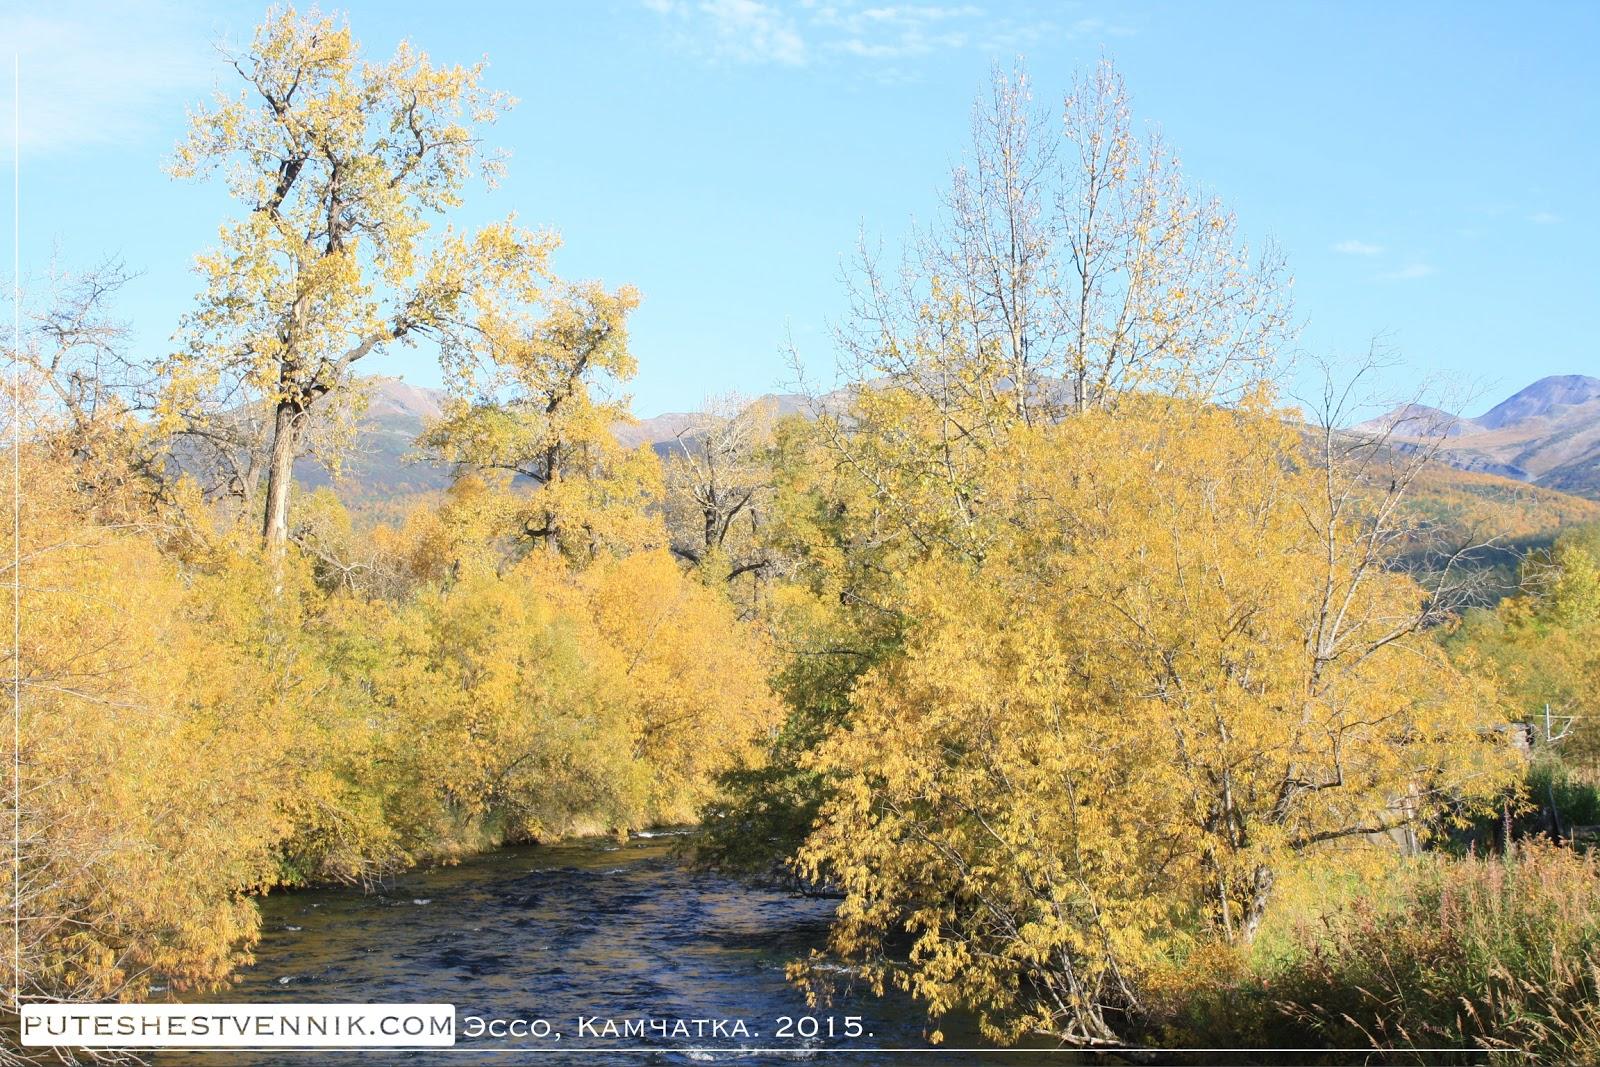 Камчатская река